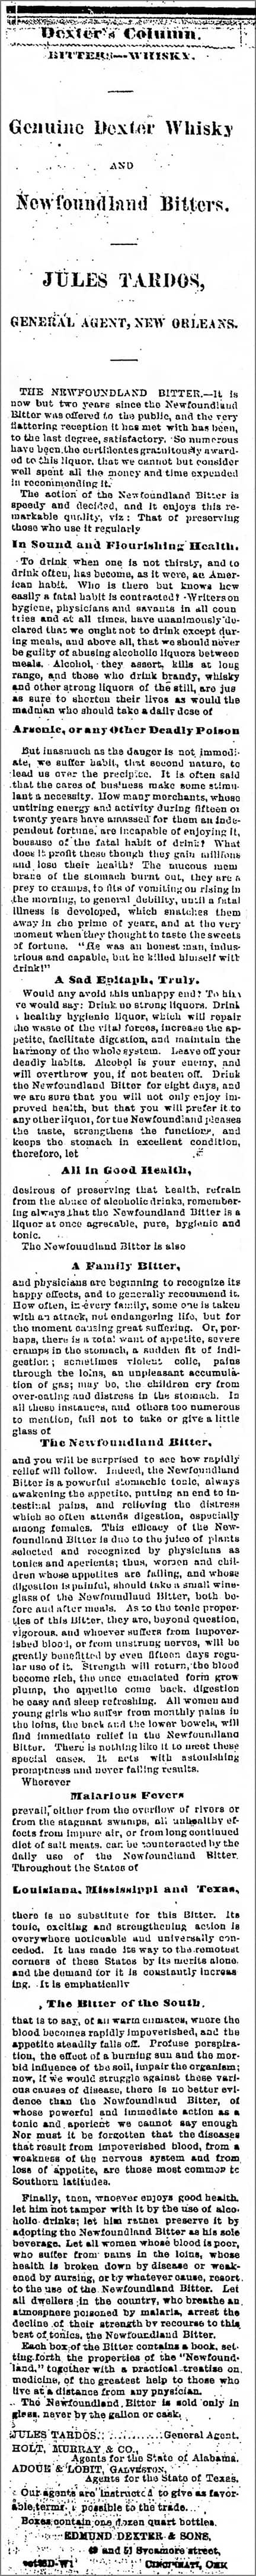 NewfoundlandBitters_The_Galveston_Daily_News_Tue__Oct_7__1873_